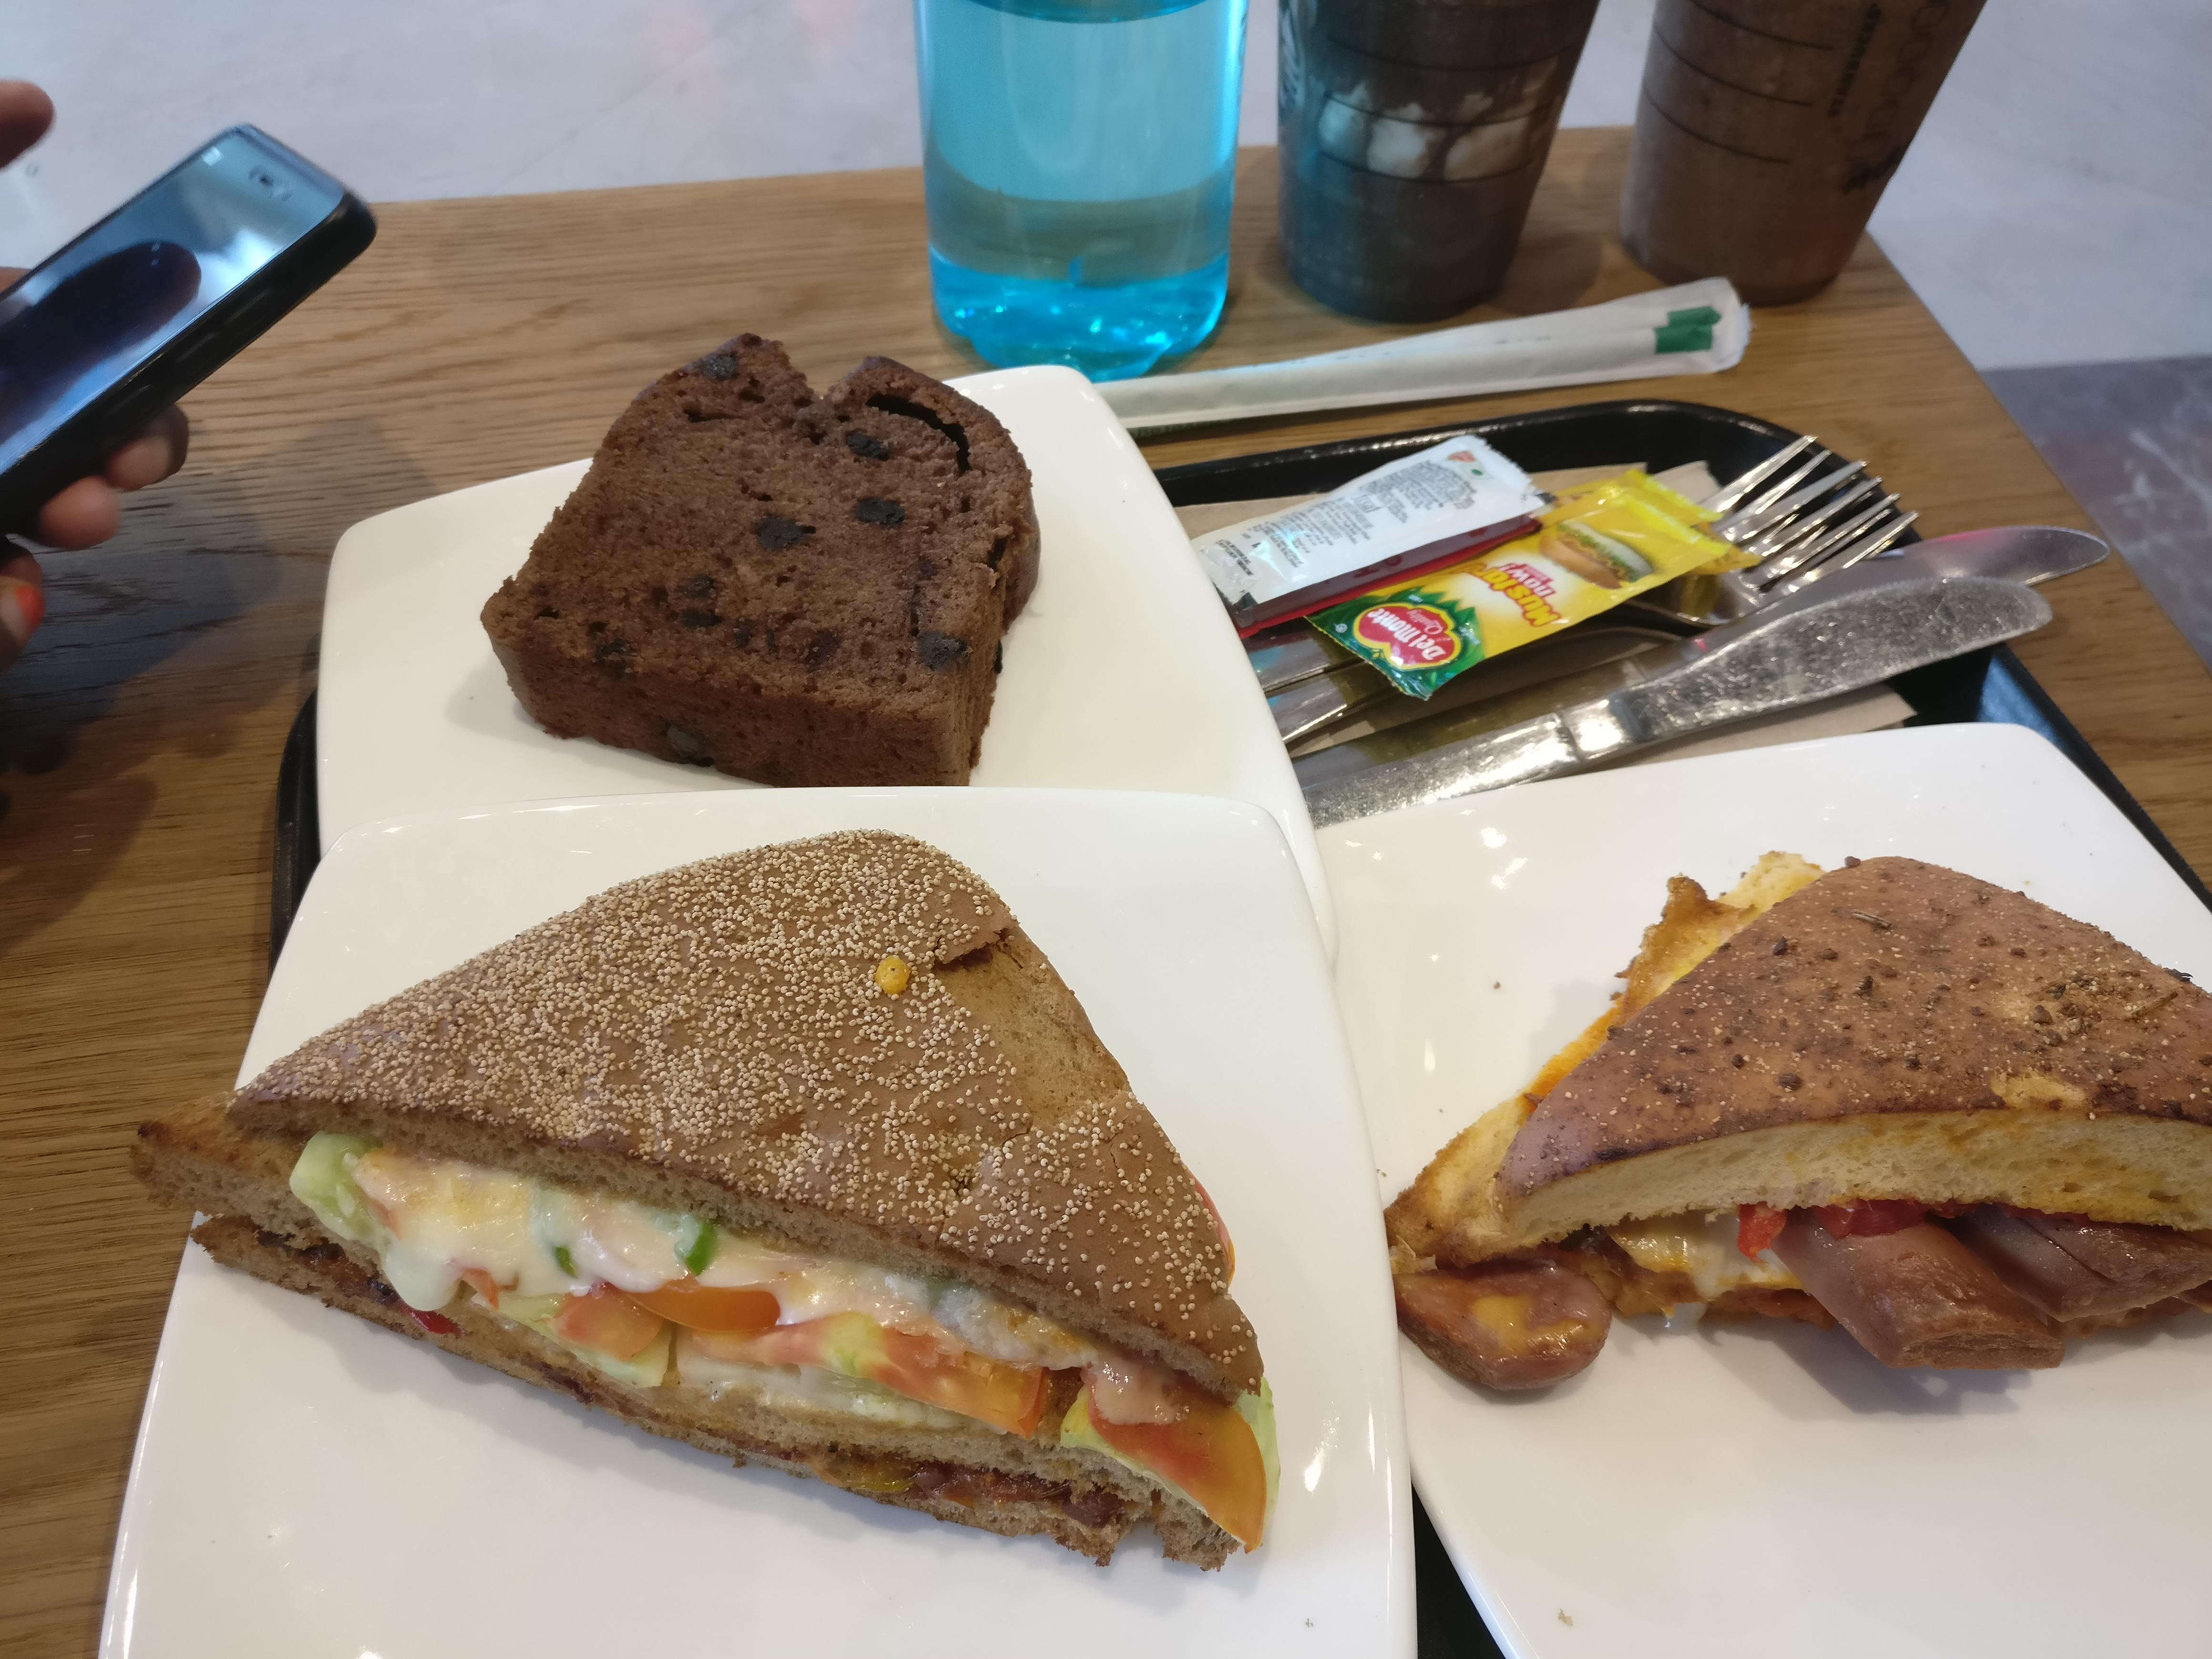 Chicken Club Sandwich, Double Meat Club Sandwich, and Banana Chocolate Cake